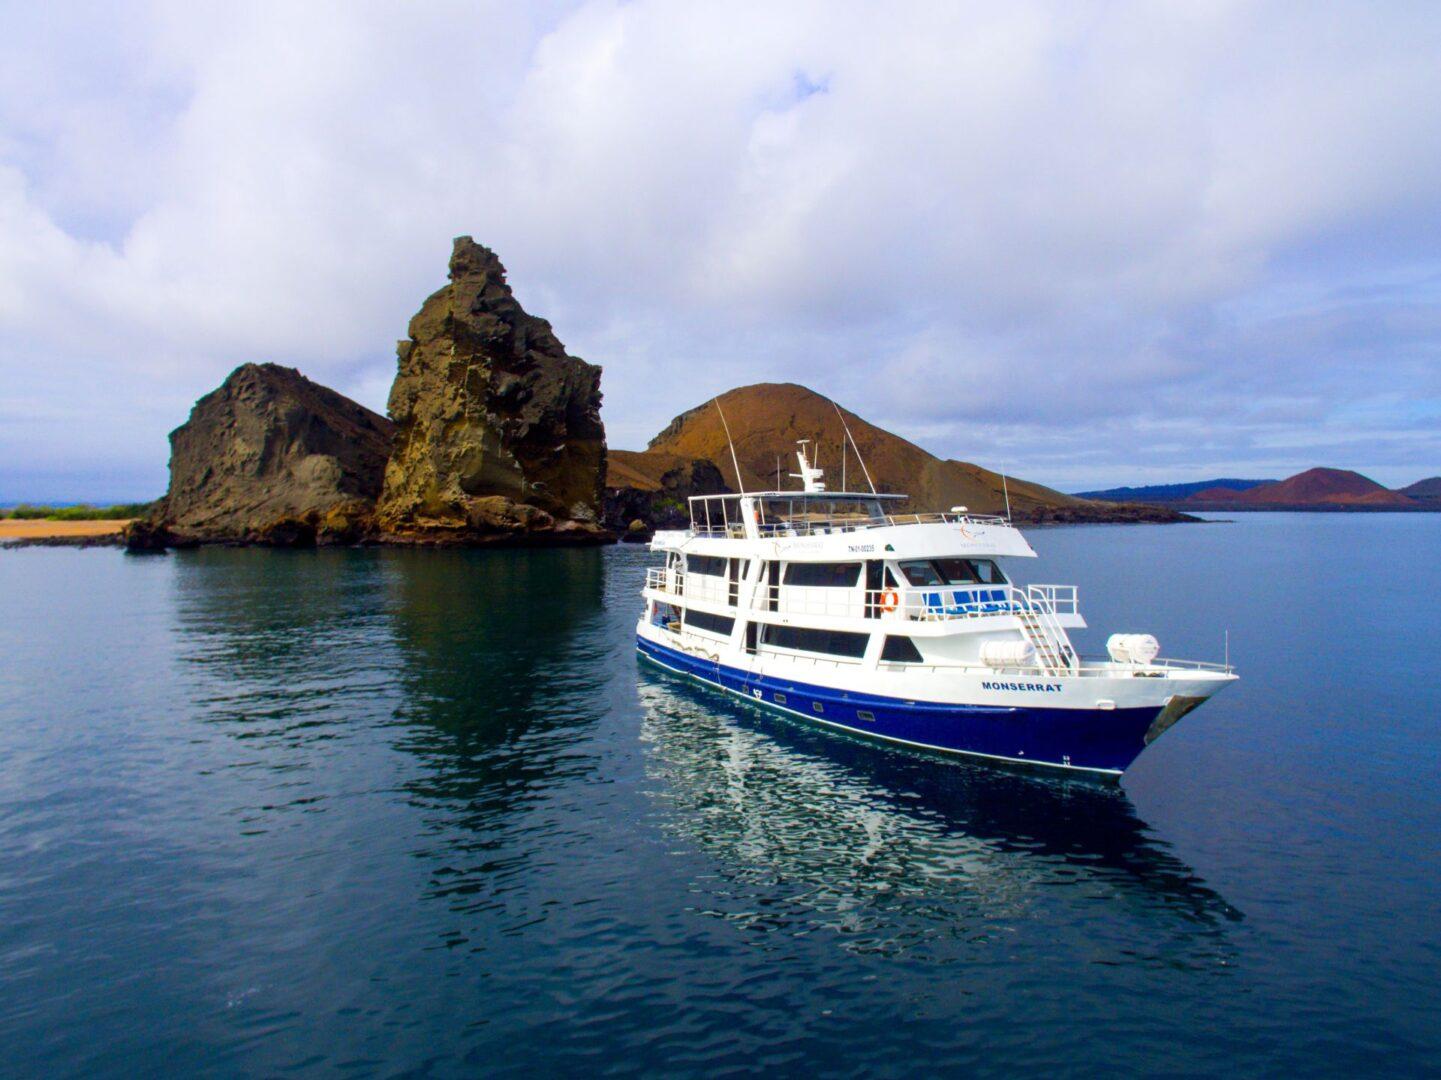 Monserrat-Galapagos-Cruises-Panoramic-Pinacle-